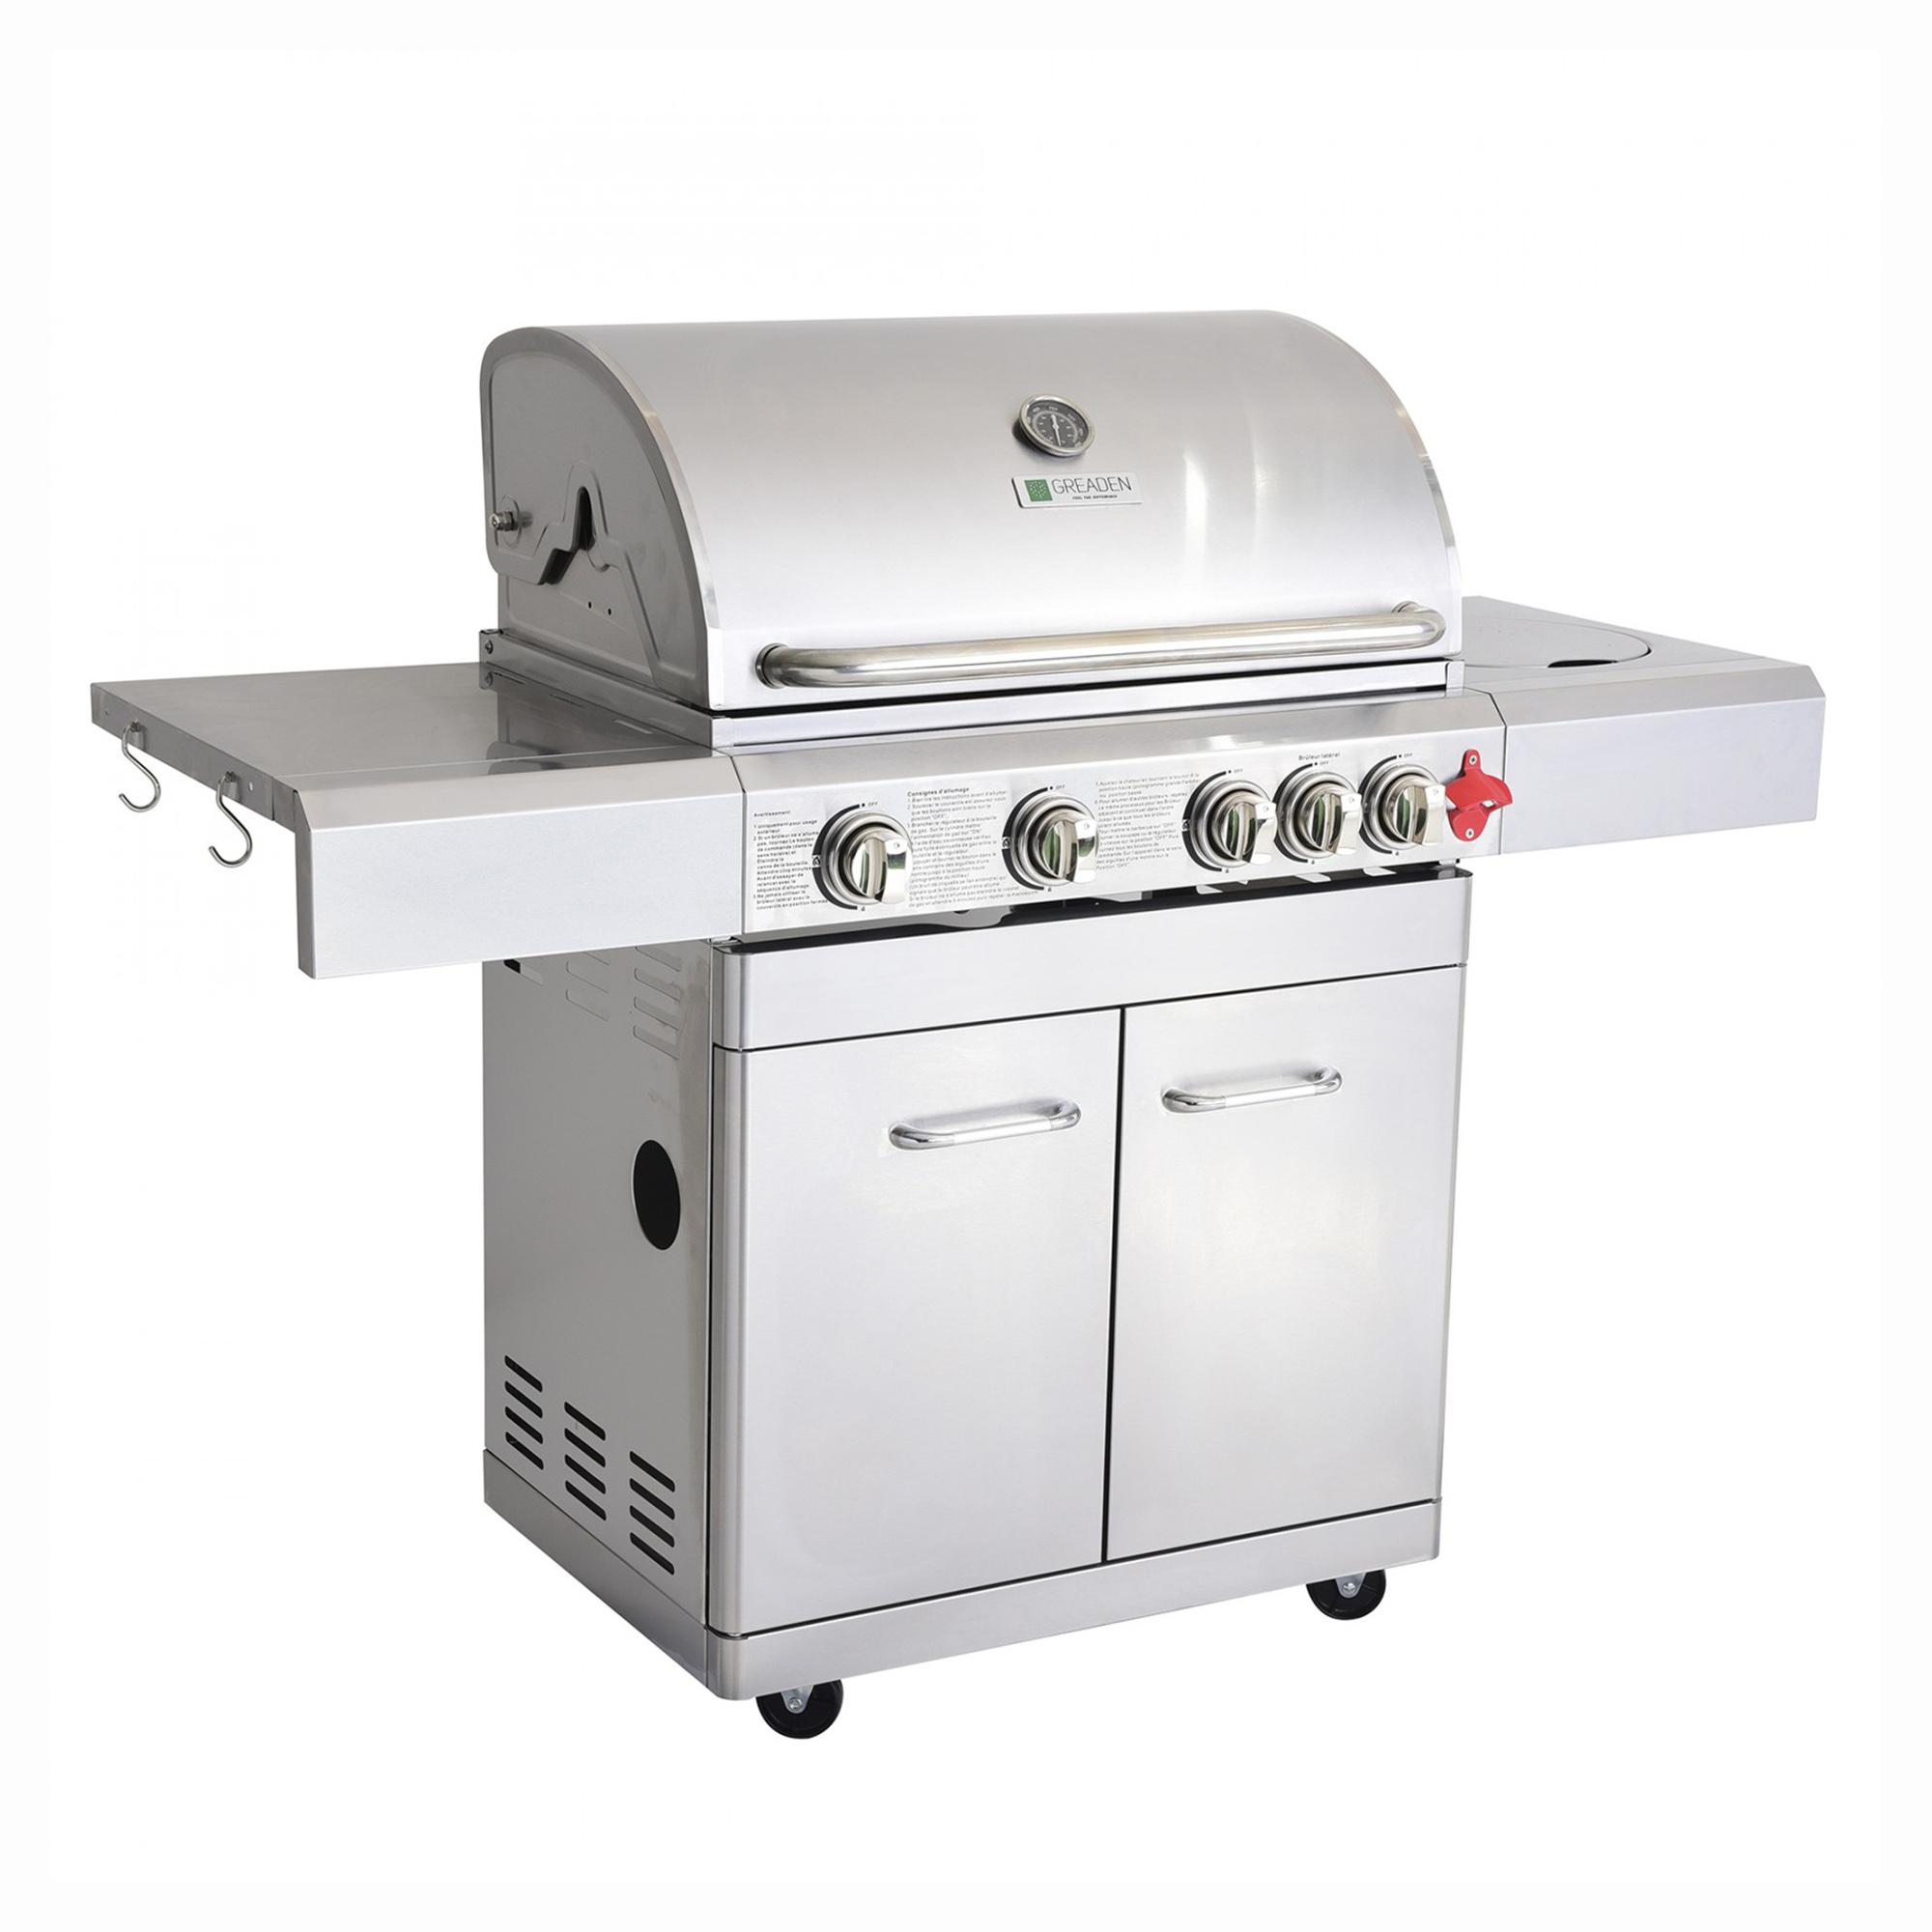 Barbecue à gaz 4 brûleurs en acier inox